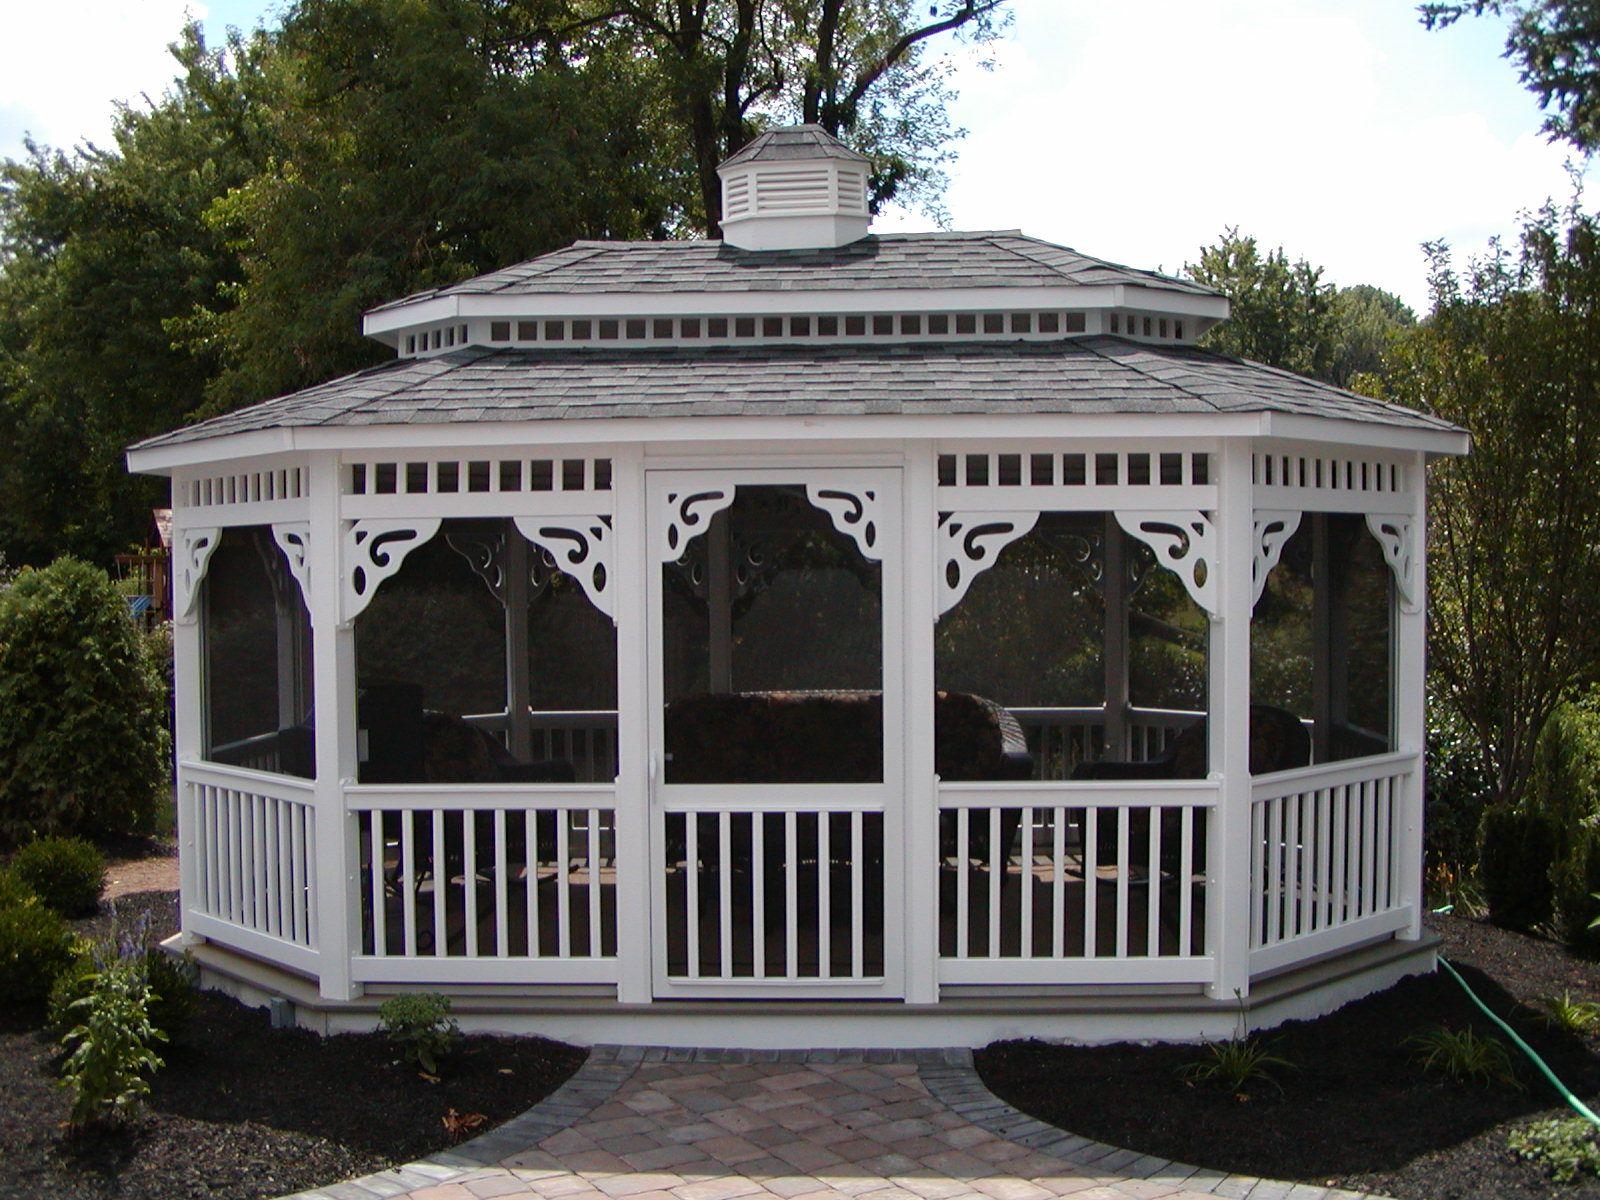 Oblong Gazebo installed by R&R CADDICK off paver patio